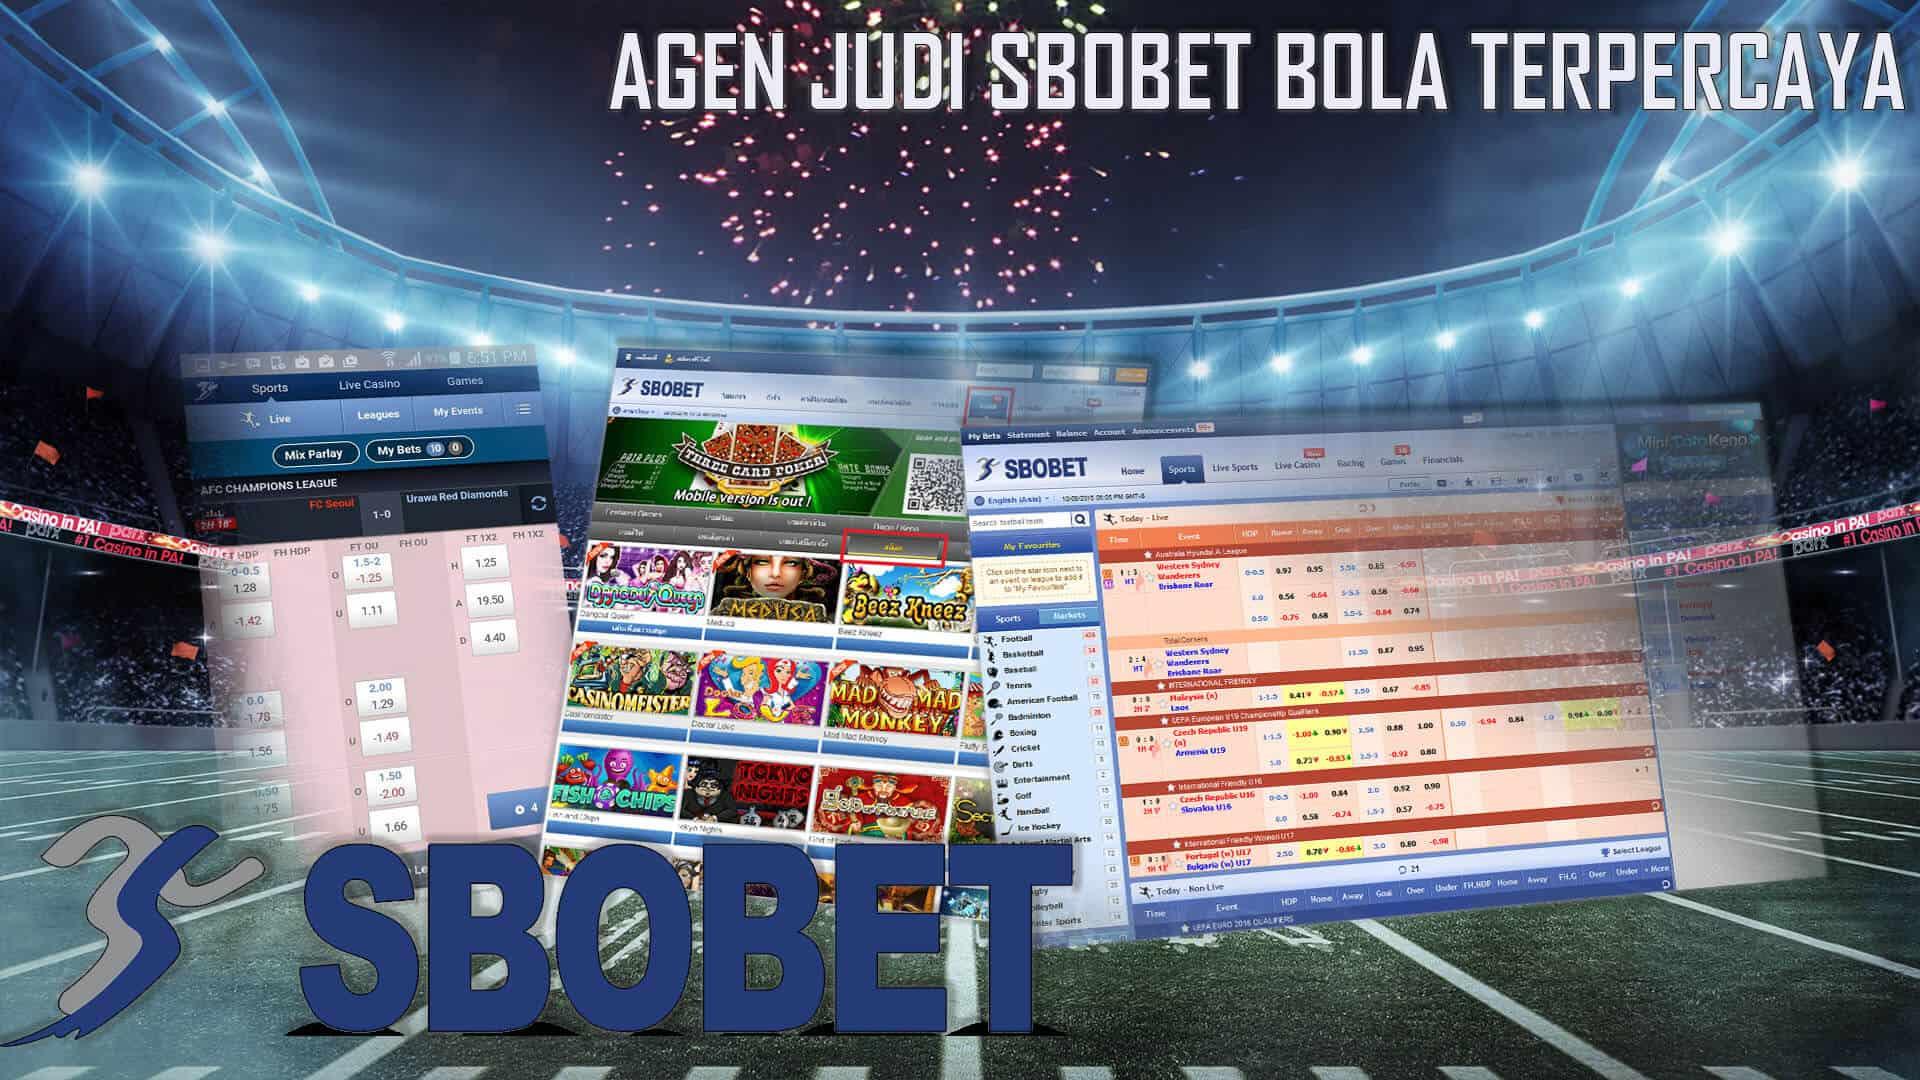 Bandar Taruhan Judi Bola 2019